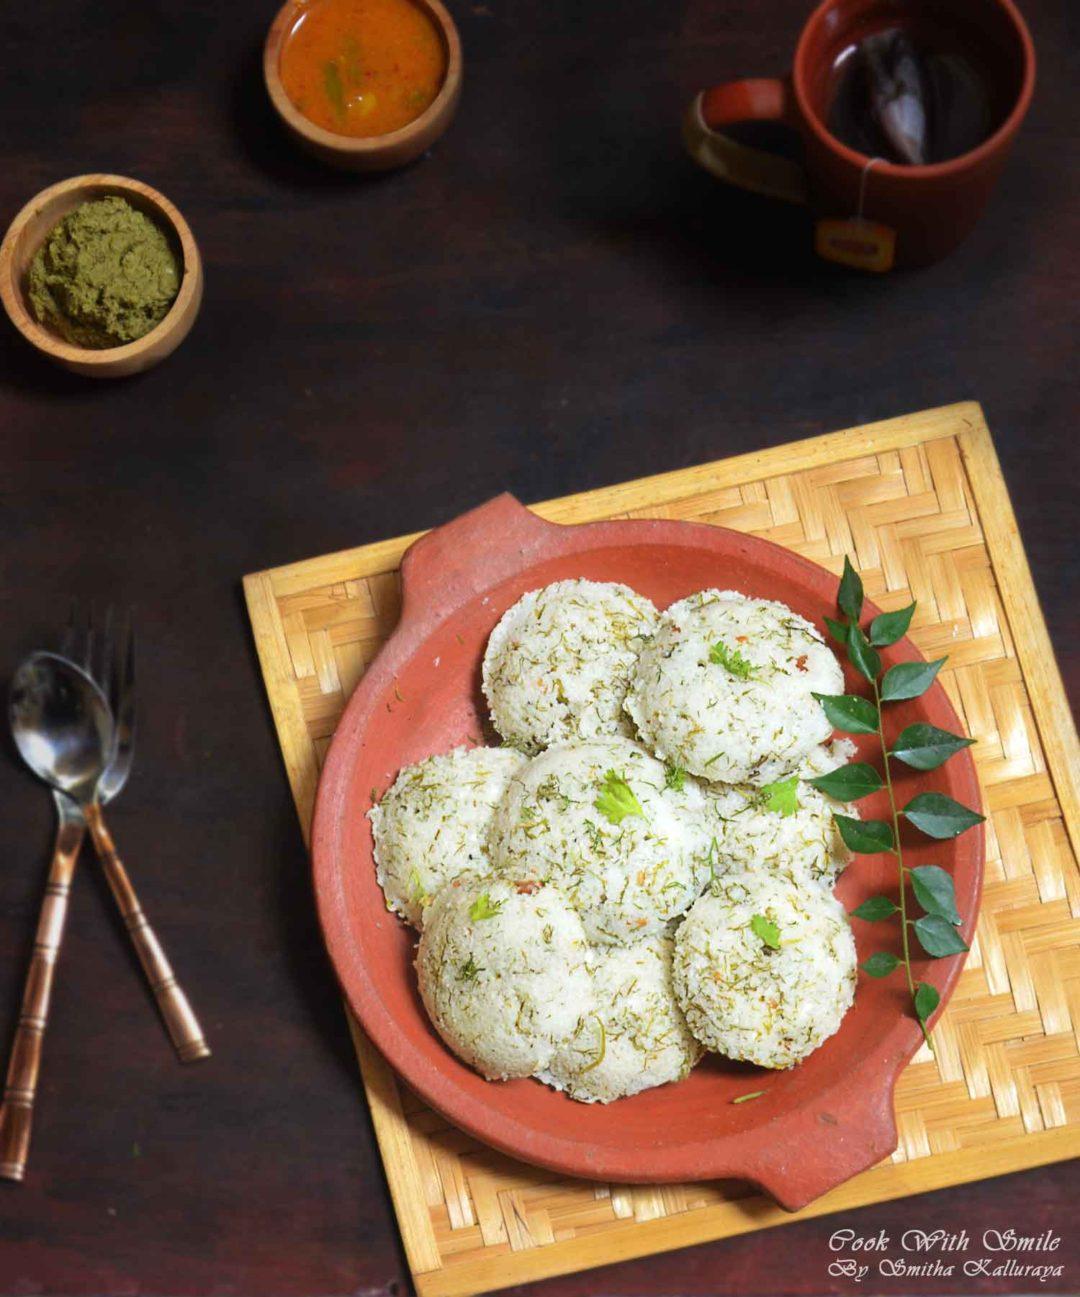 dill leaves idli recipe